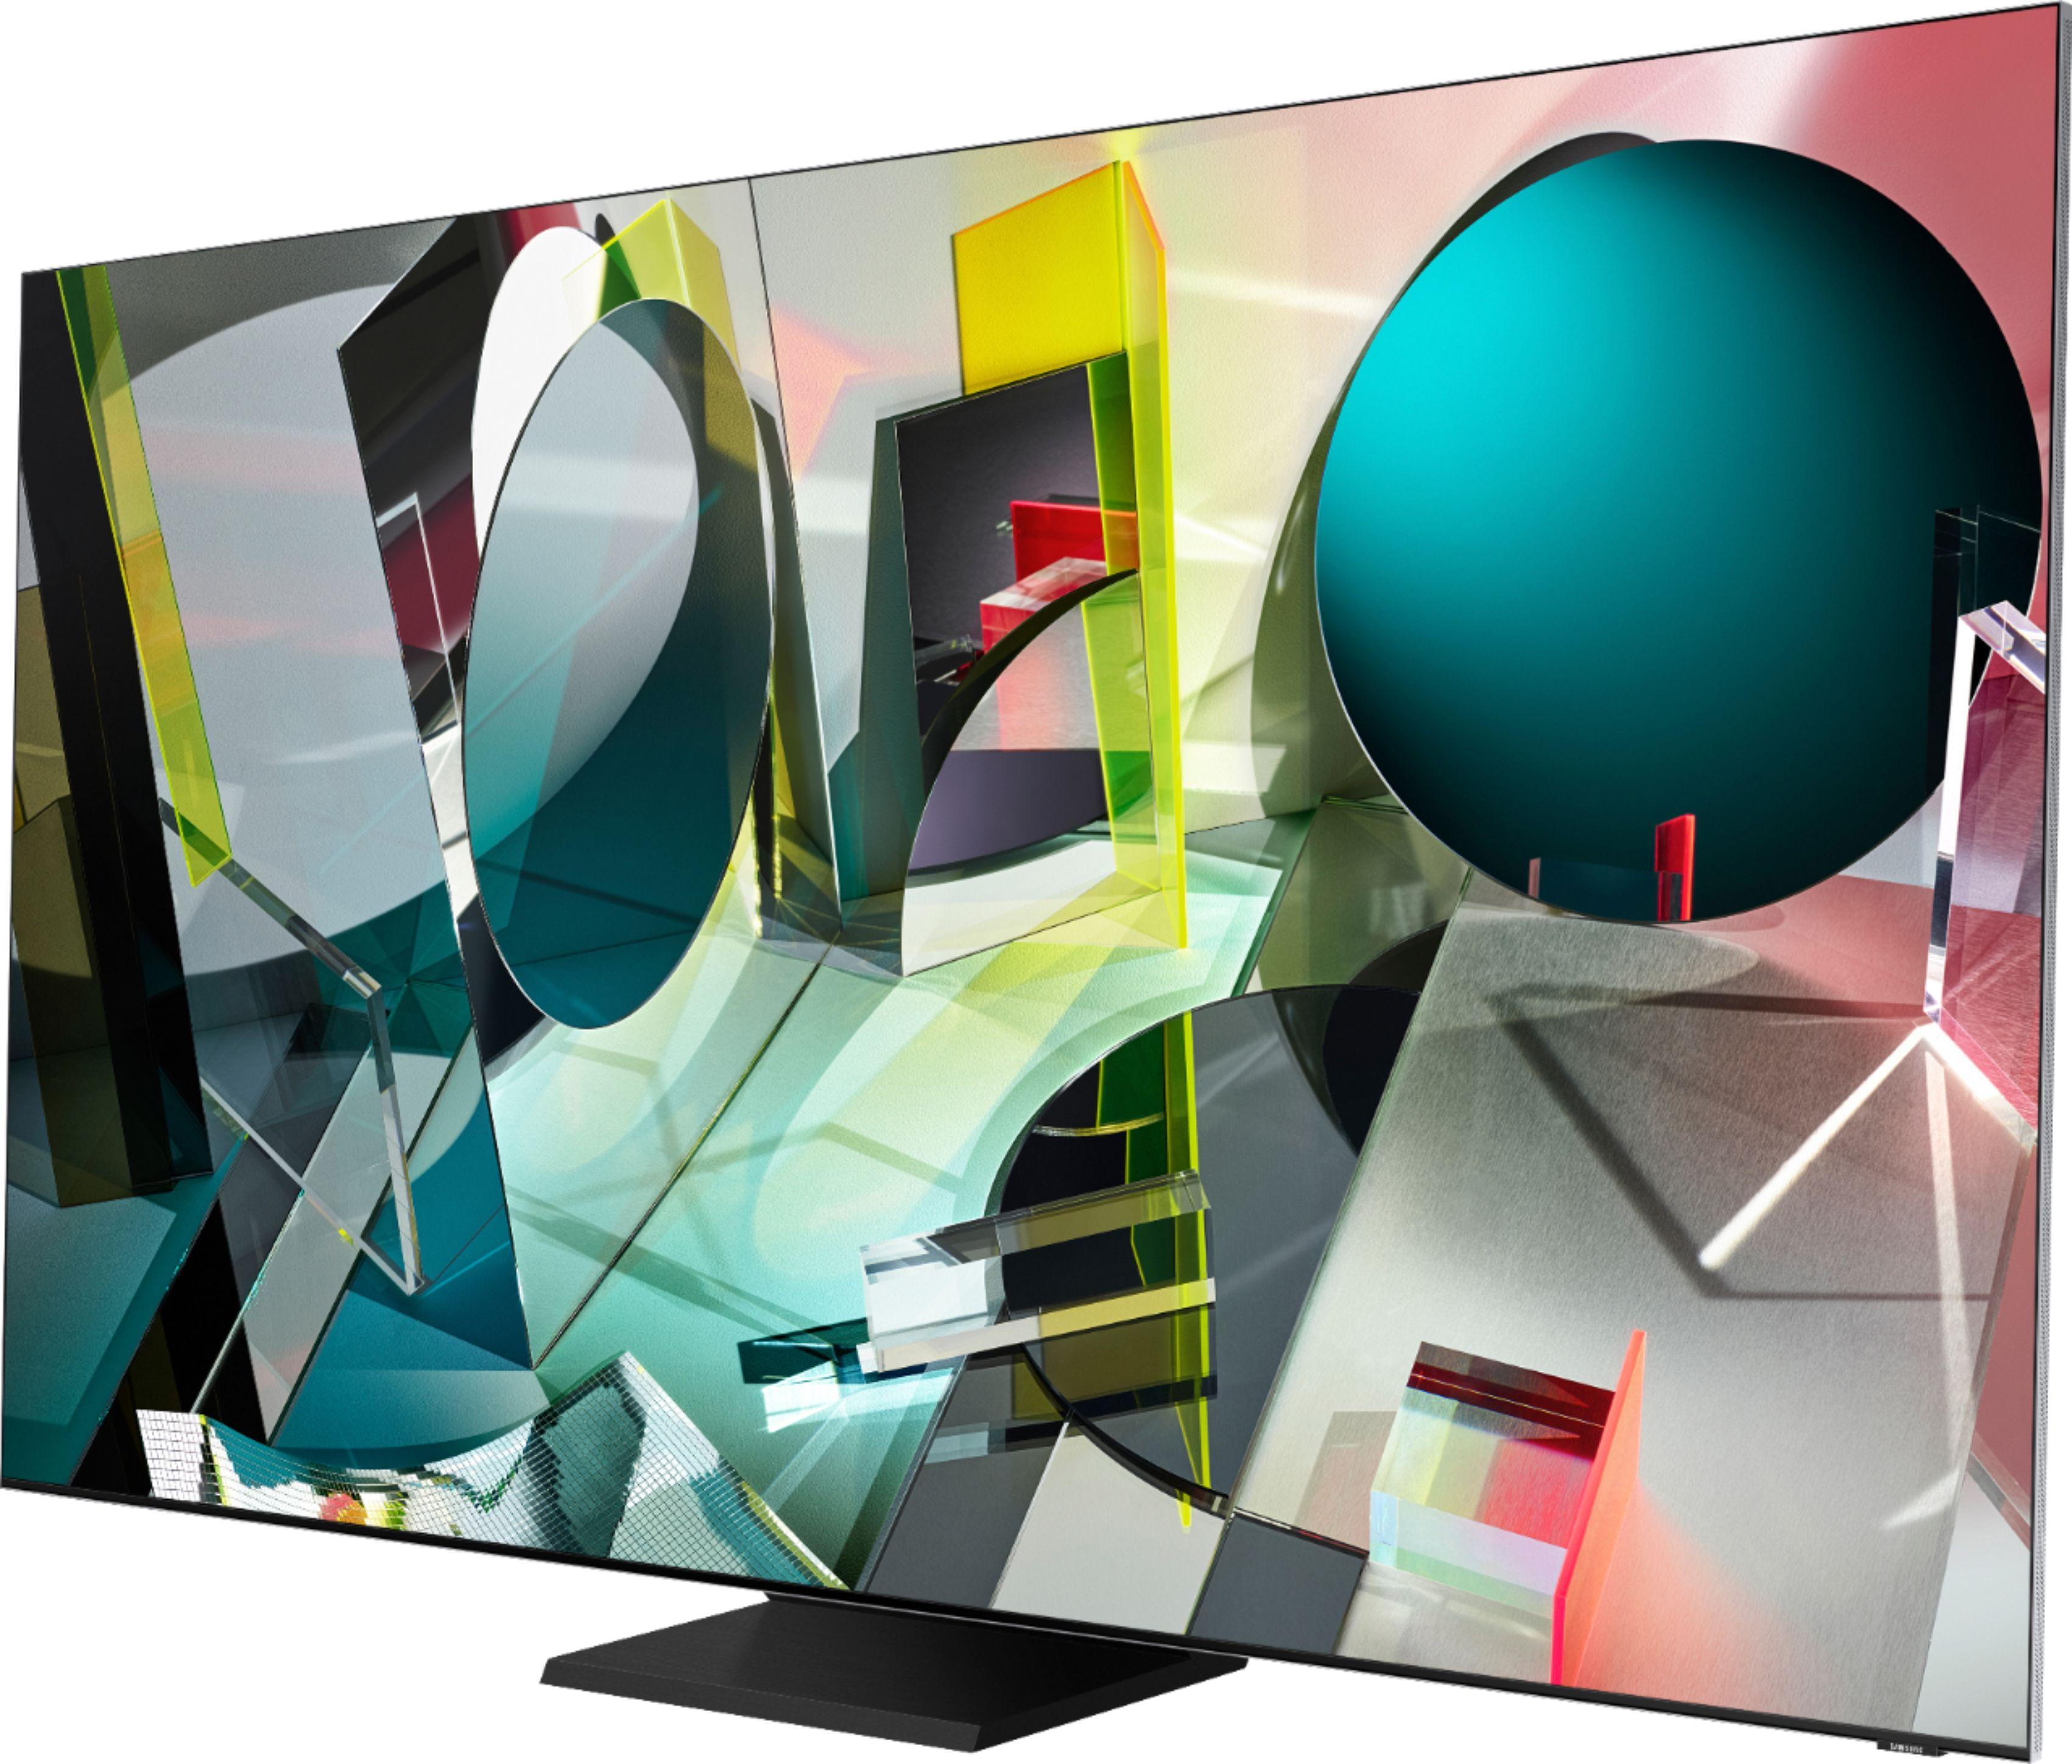 "85"" Q900TS Series 8K UHD TV Smart LED with HDR"